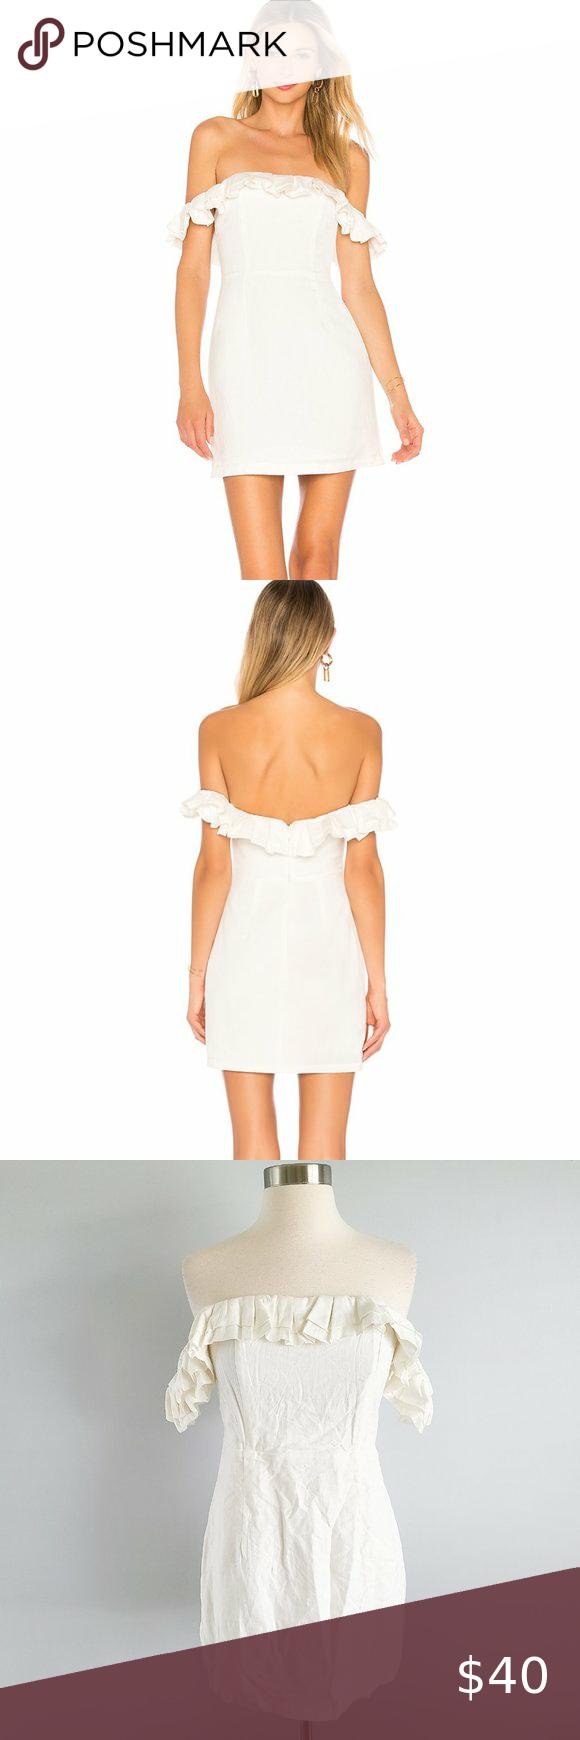 Superdown Emery Off The Shoulder Mini Dress Mini Dress Knit Mini Dress Lace Mini Dress [ 1740 x 580 Pixel ]